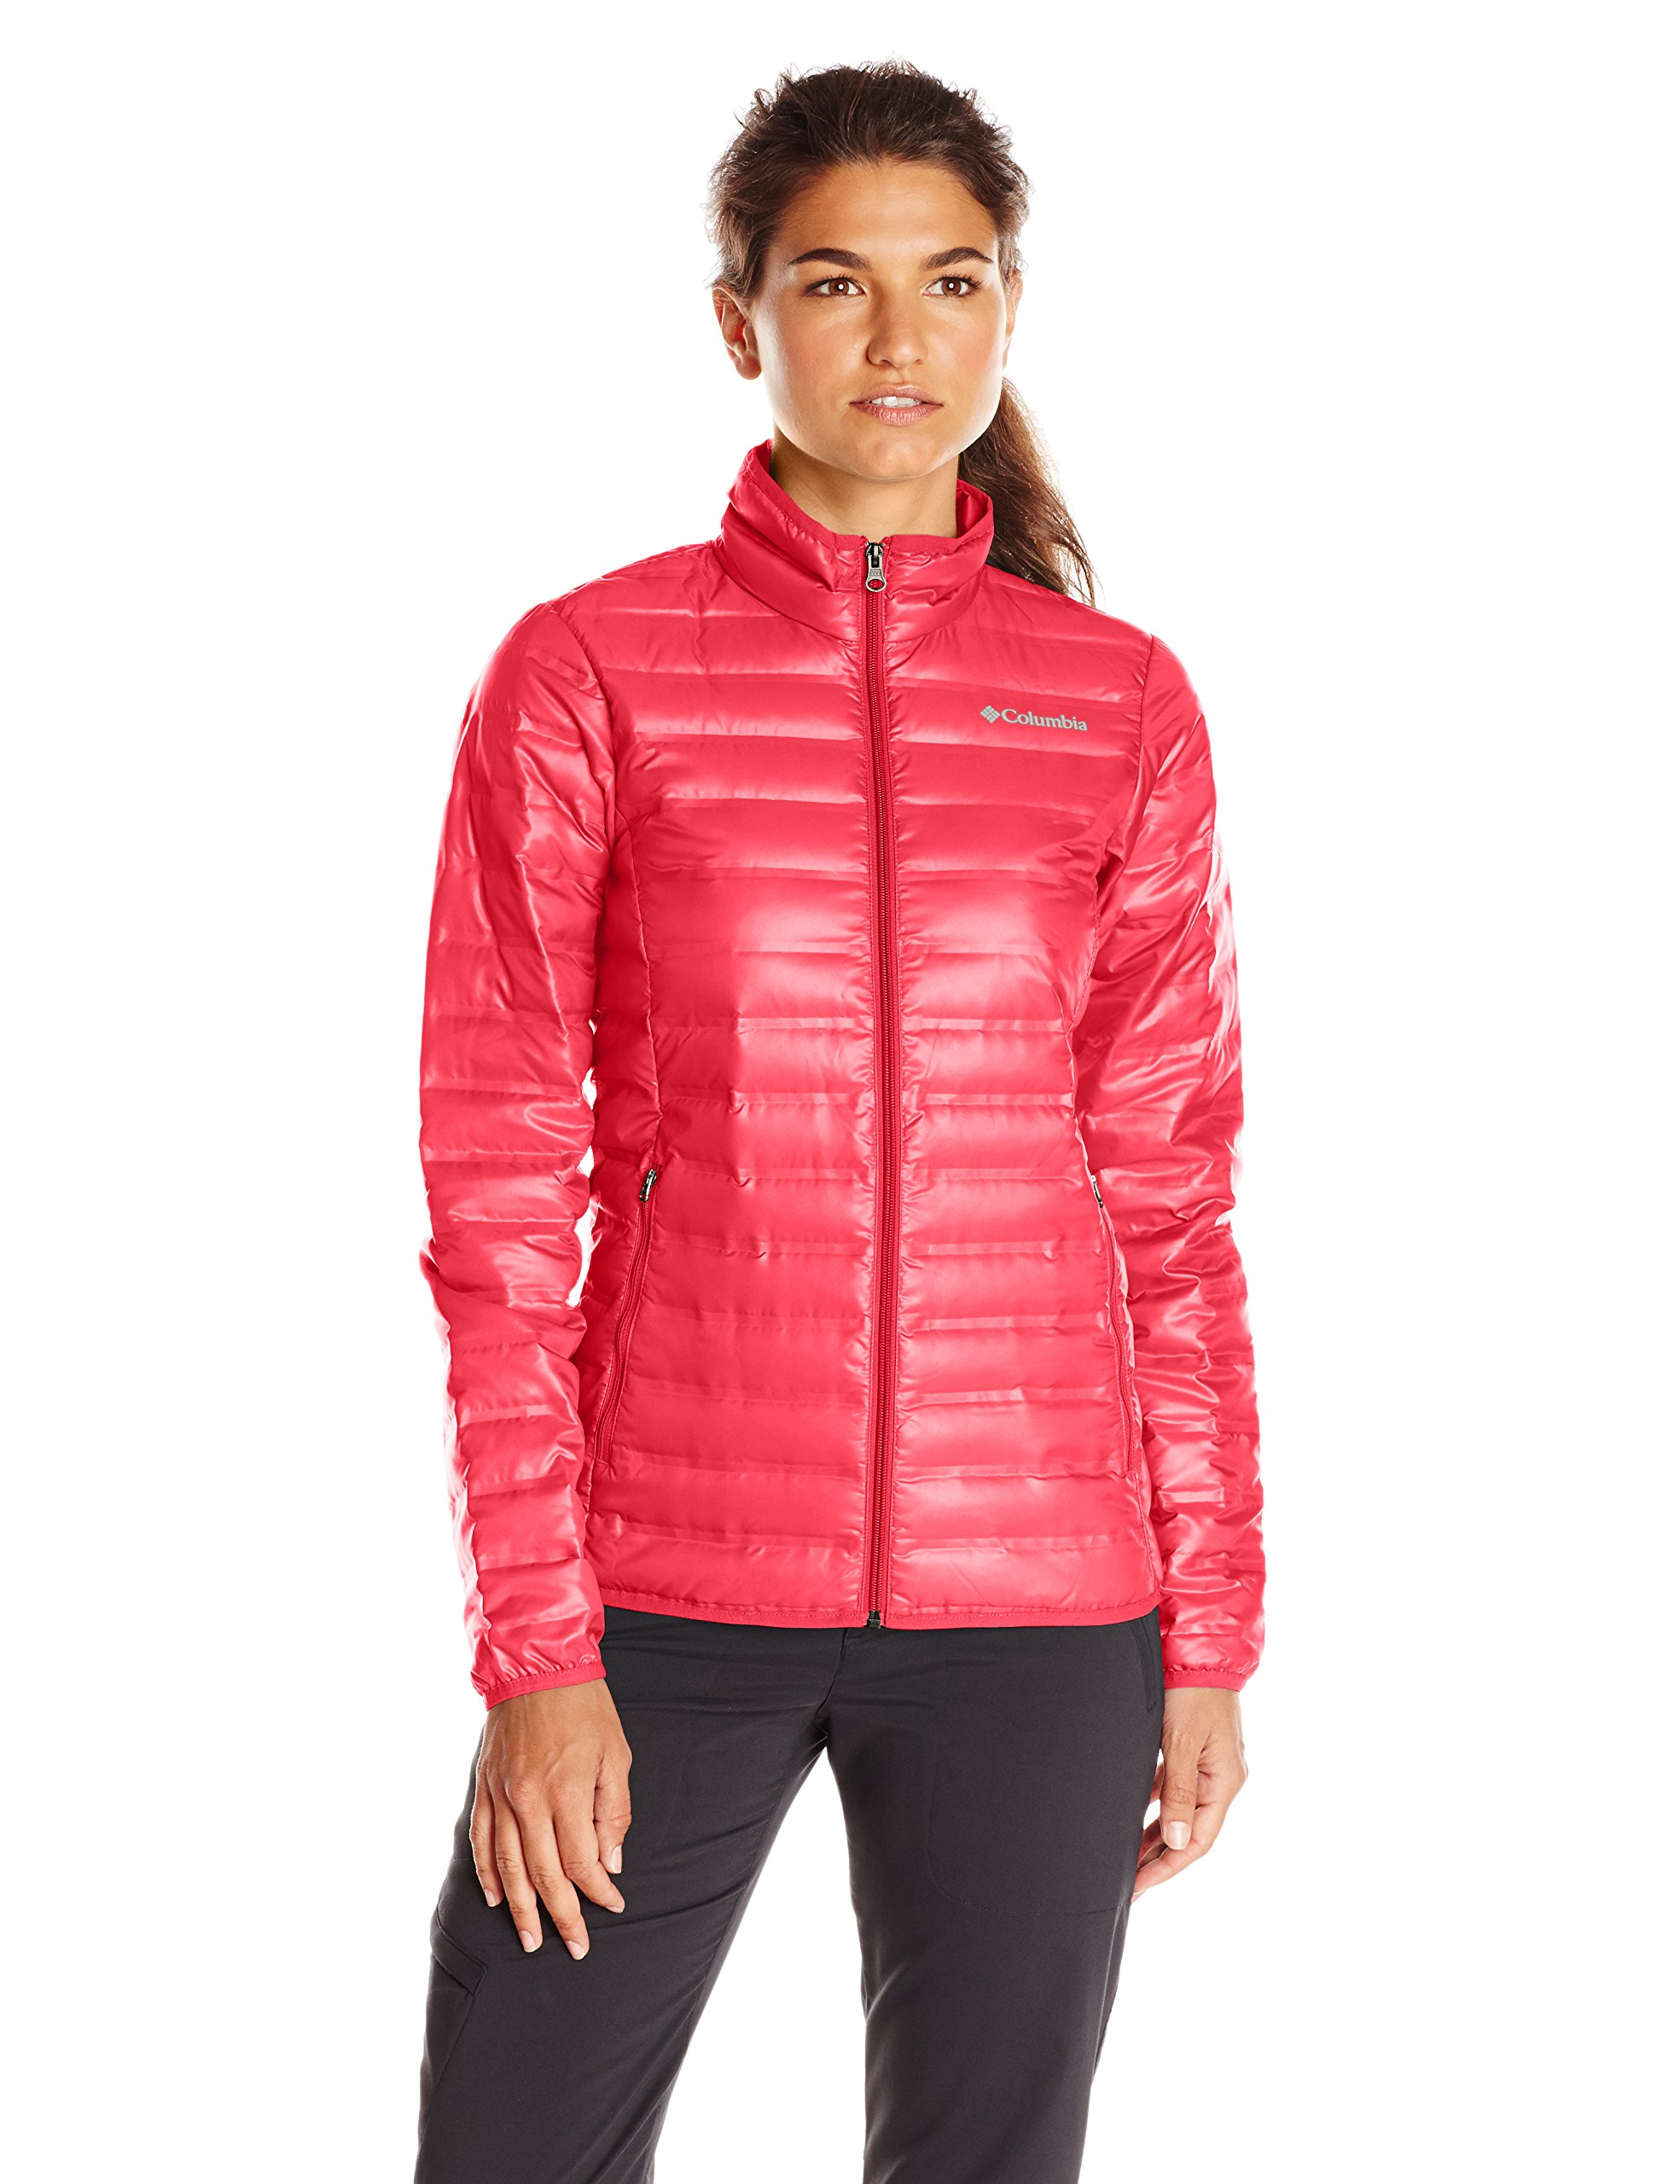 Columbia Women's Flash Forward Down Jacket, Red Camellia/Spray, Small